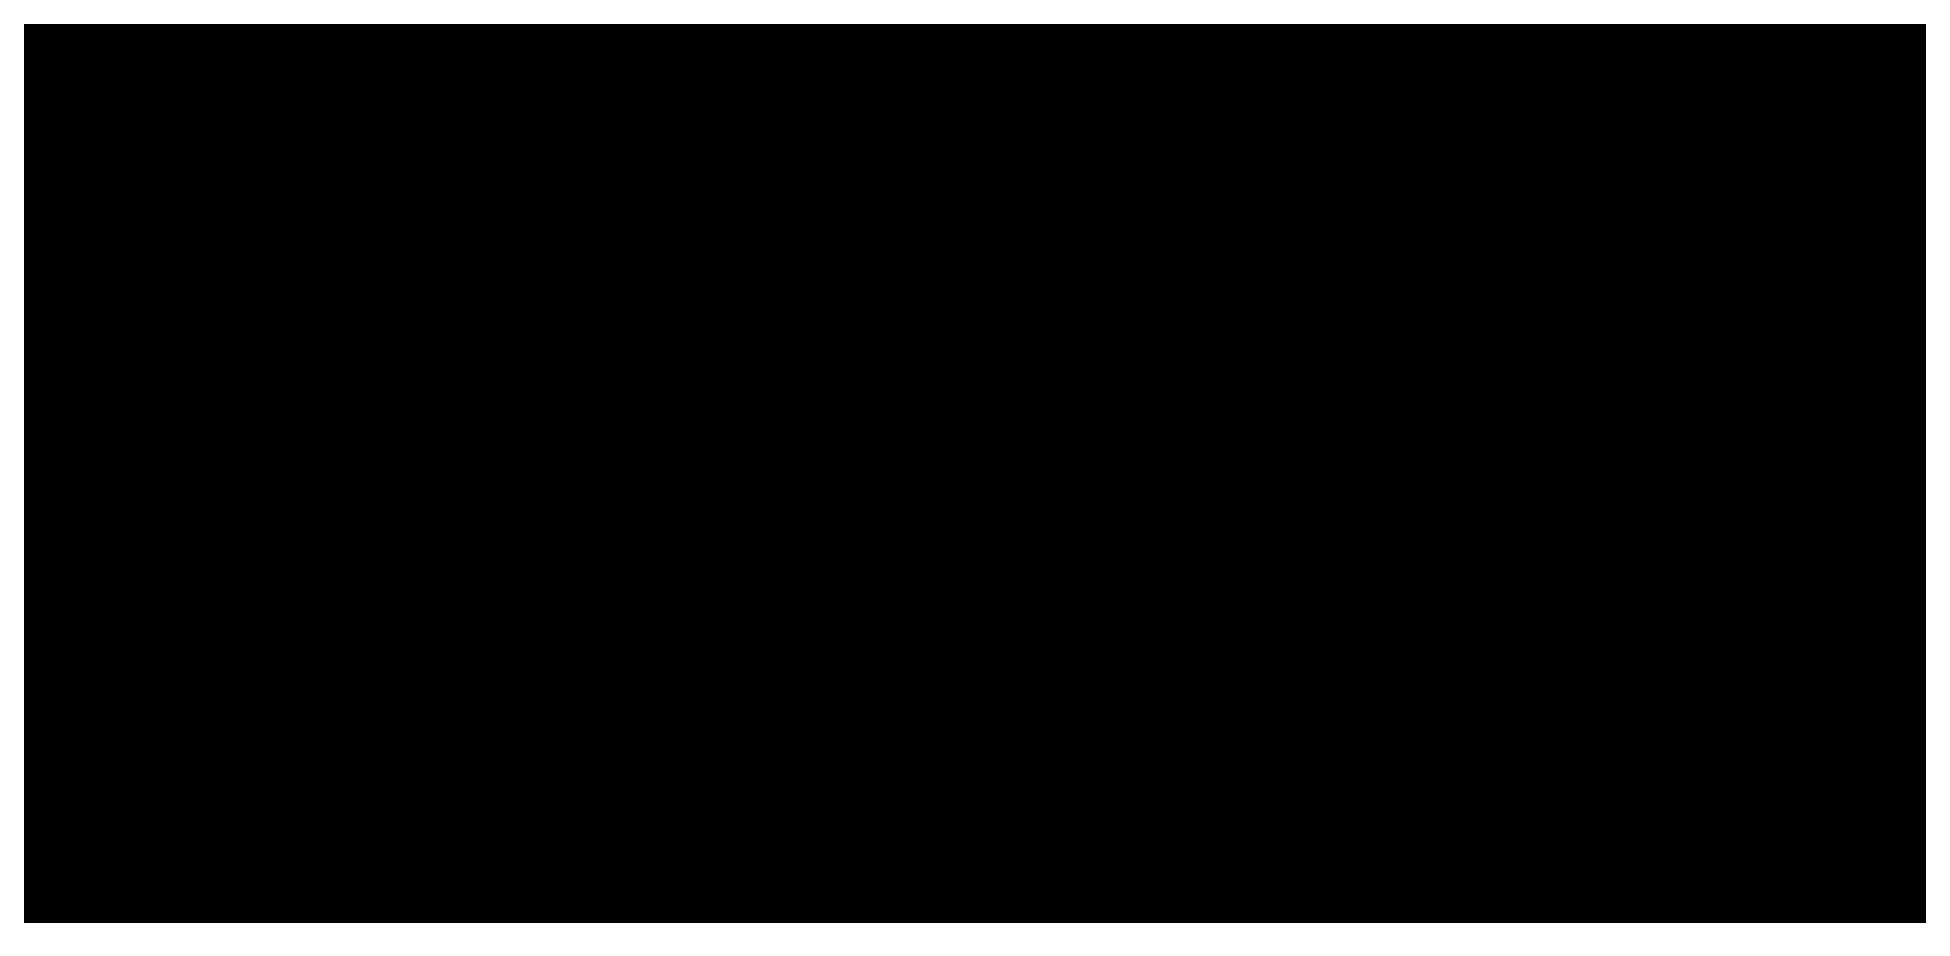 ari foundation logo black